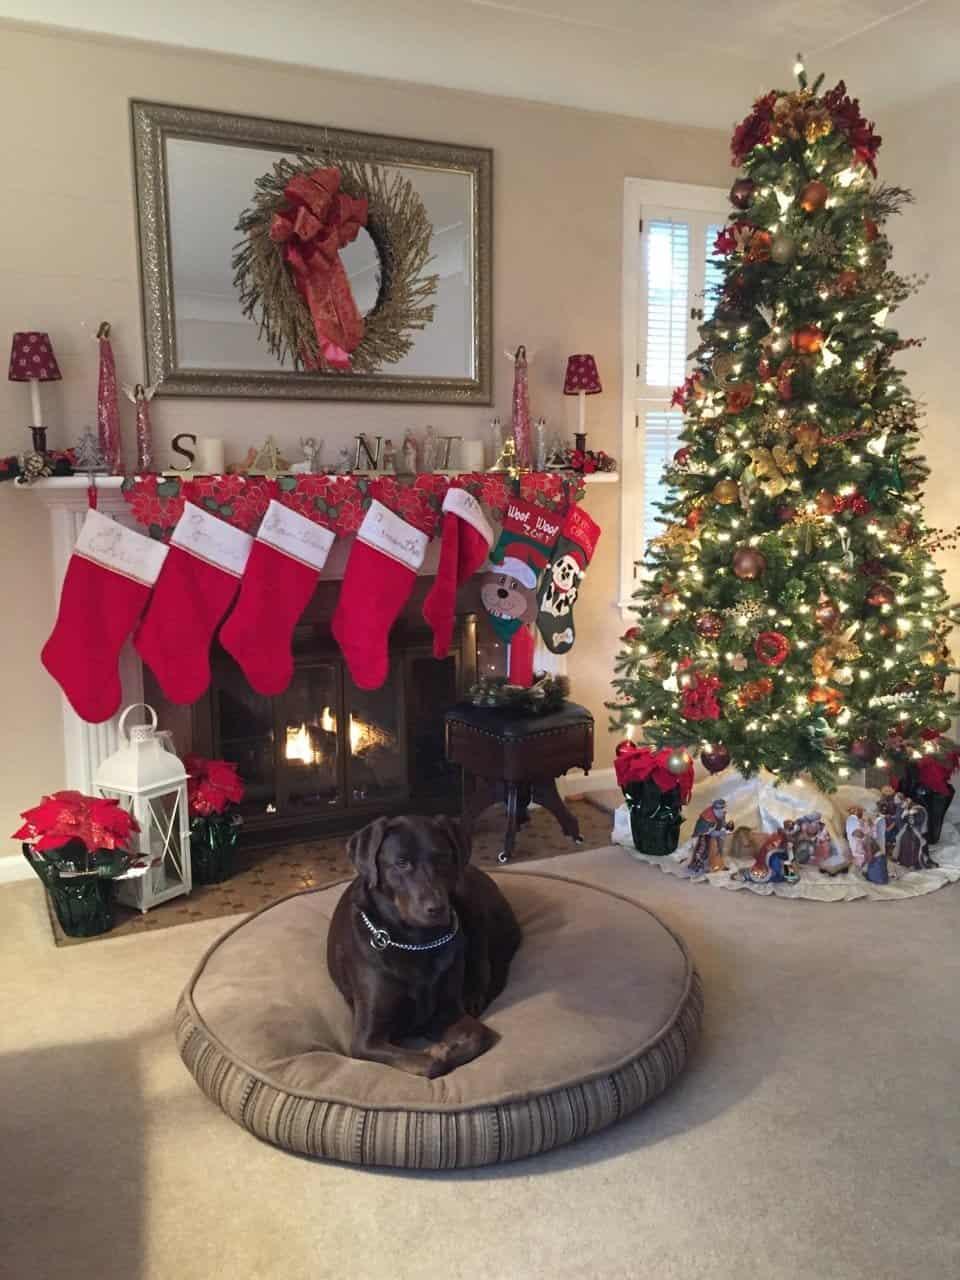 Wishing everyone a beautiful holiday season